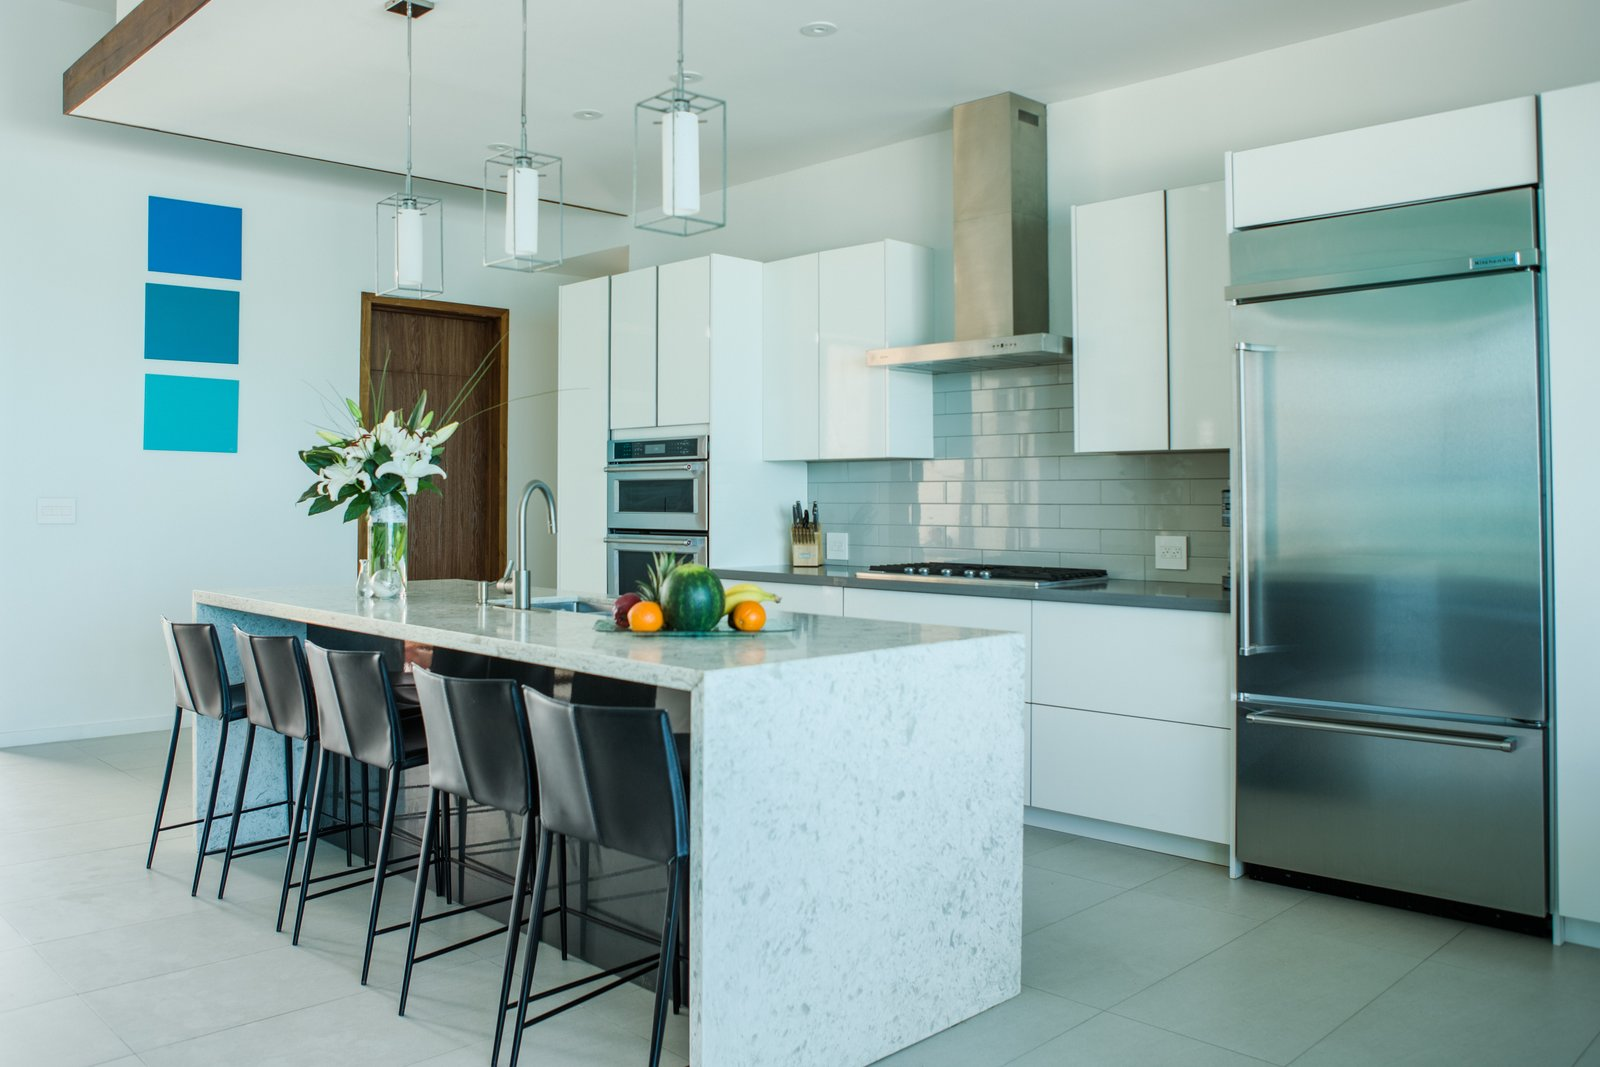 Kitchen, White Cabinet, Subway Tile Backsplashe, Porcelain Tile Floor, Pendant Lighting, Refrigerator, Cooktops, Marble Counter, and Drop In Sink  Tip of the Tail Villa